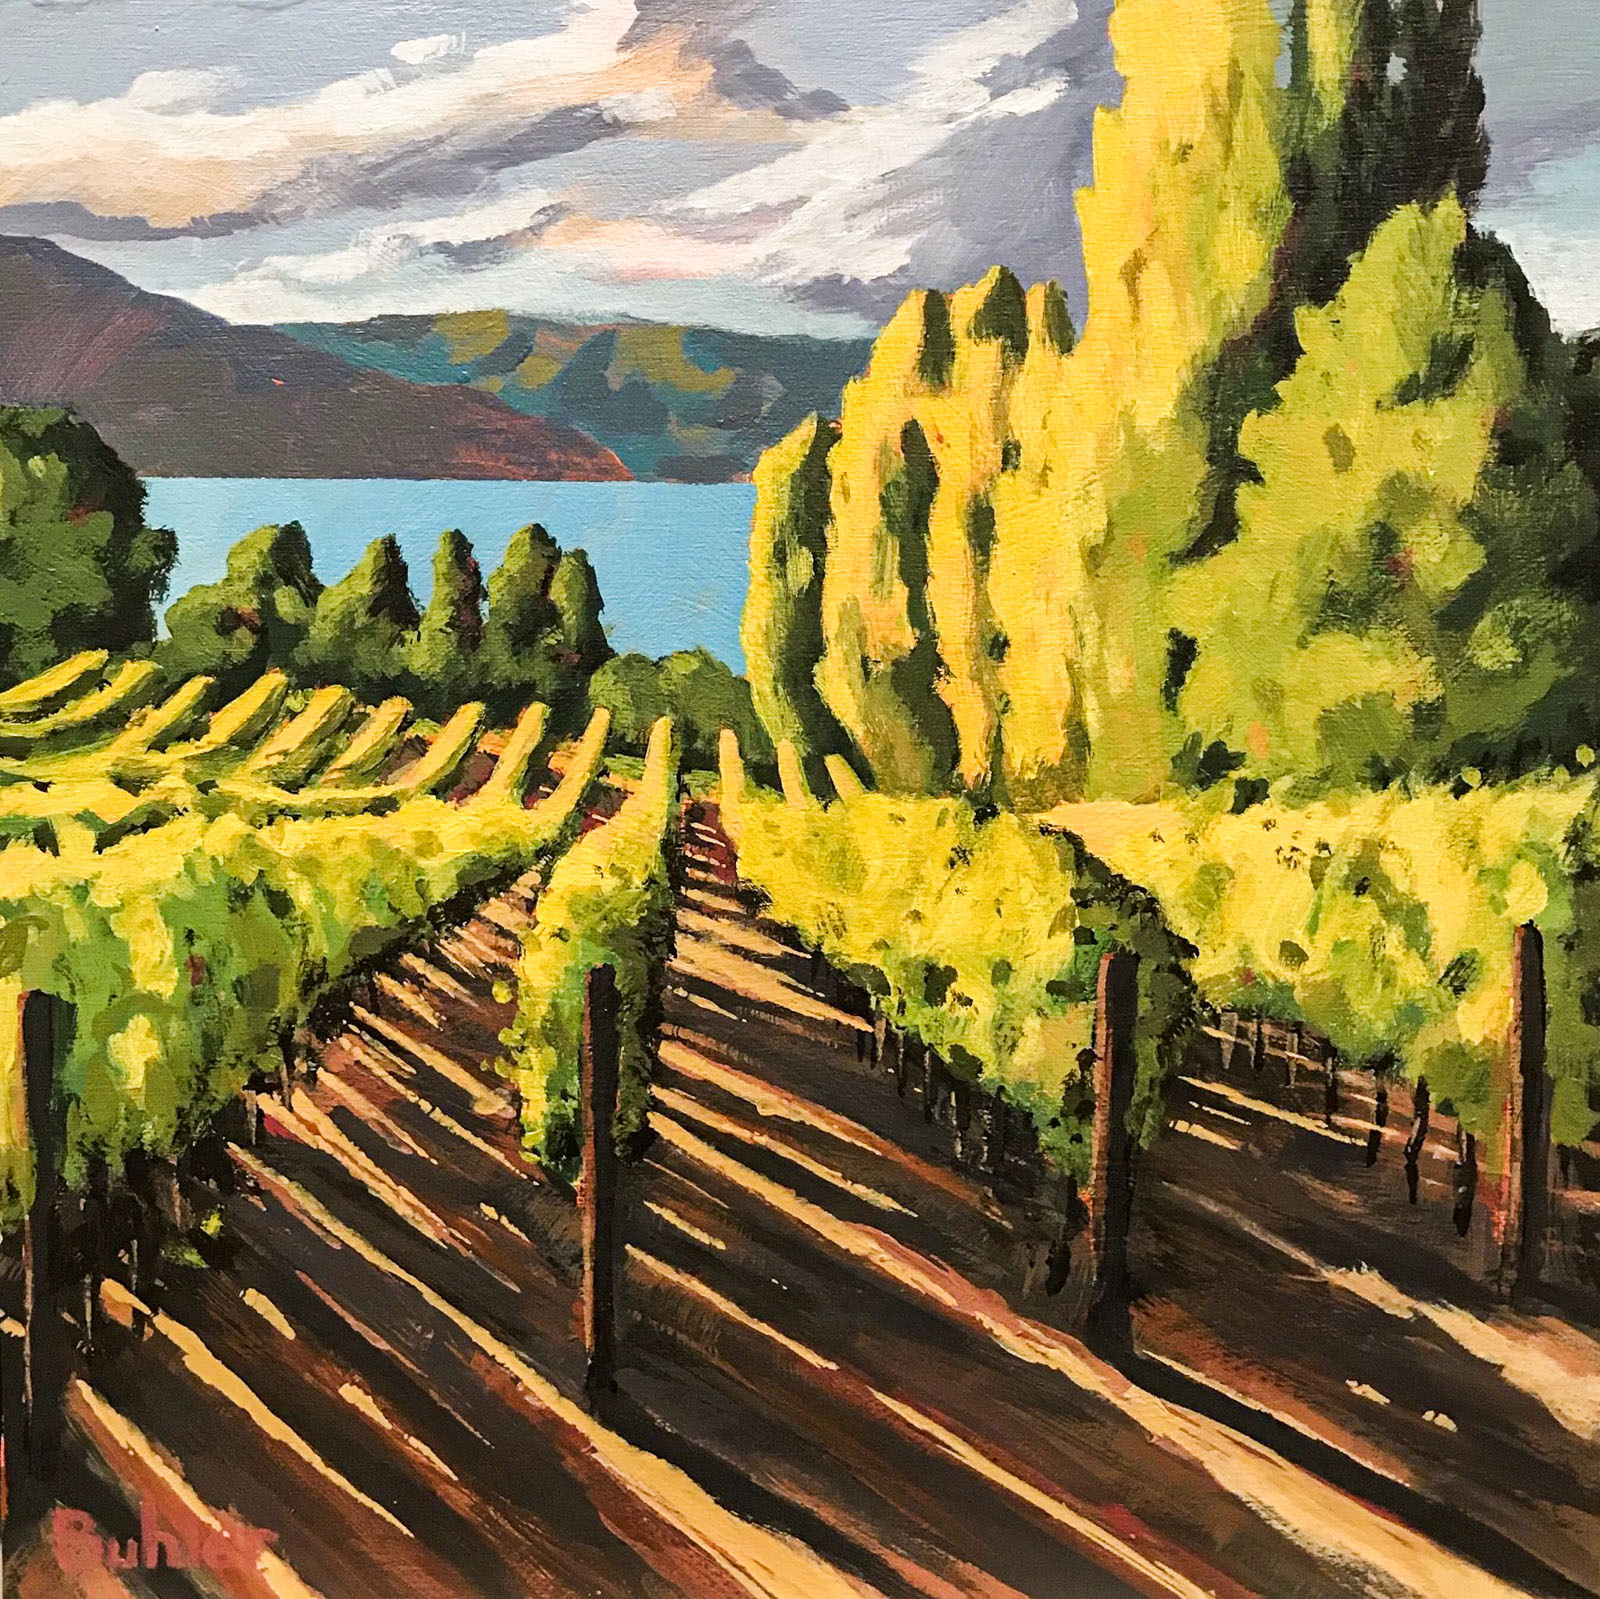 La Frenz Vineyard, Naramata